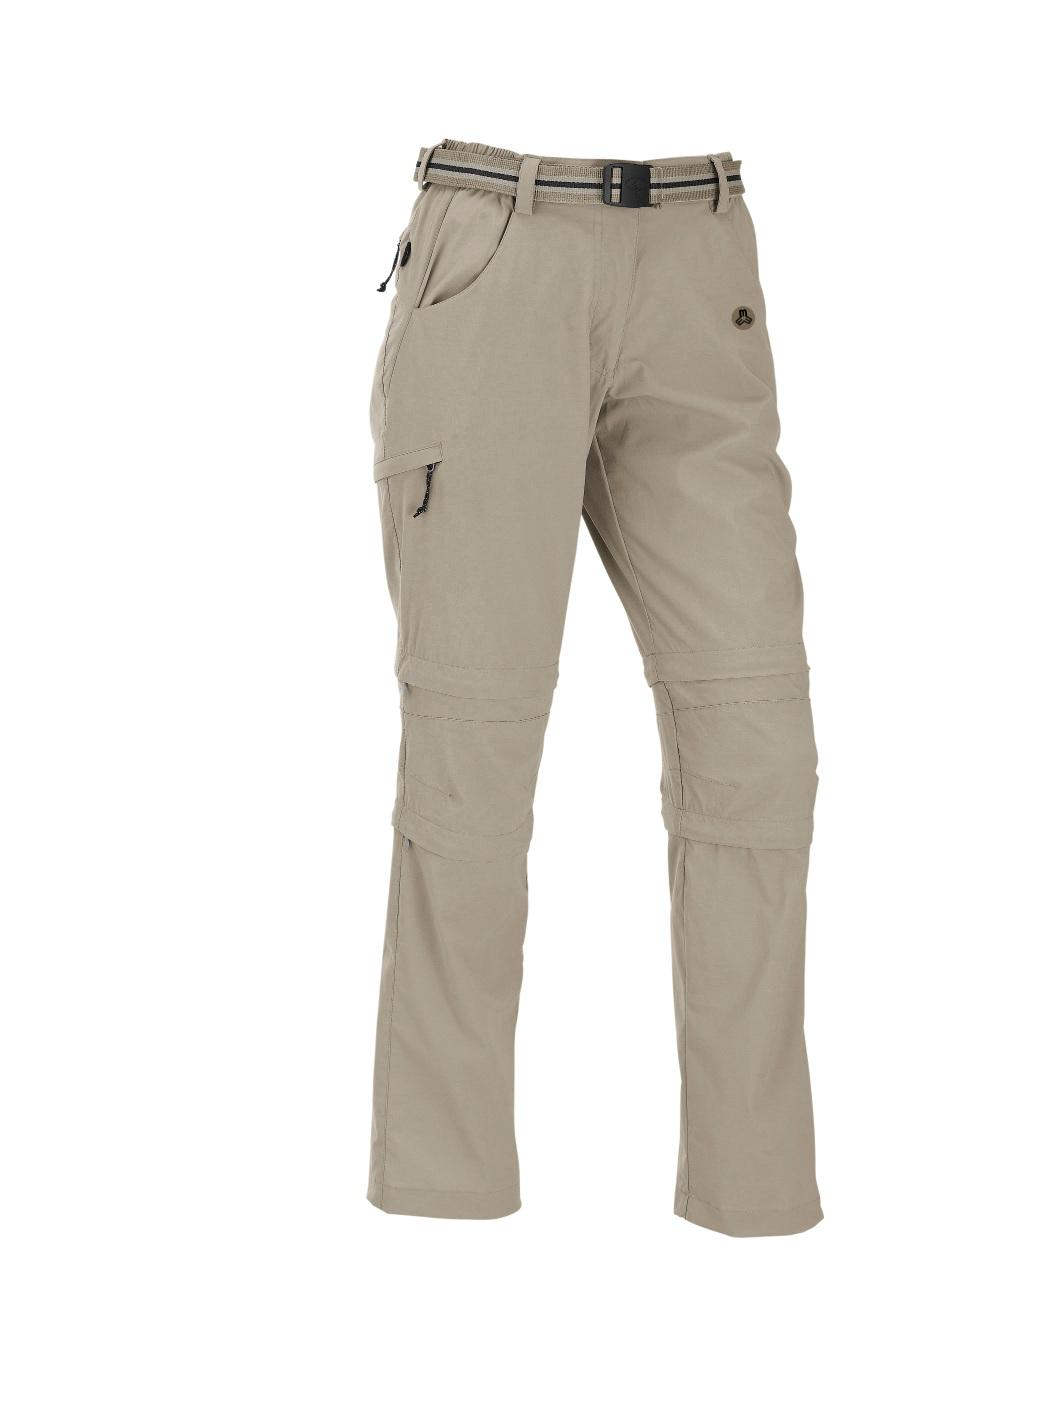 Feldberg – 3-in-1 Zipp-Hose elastisch